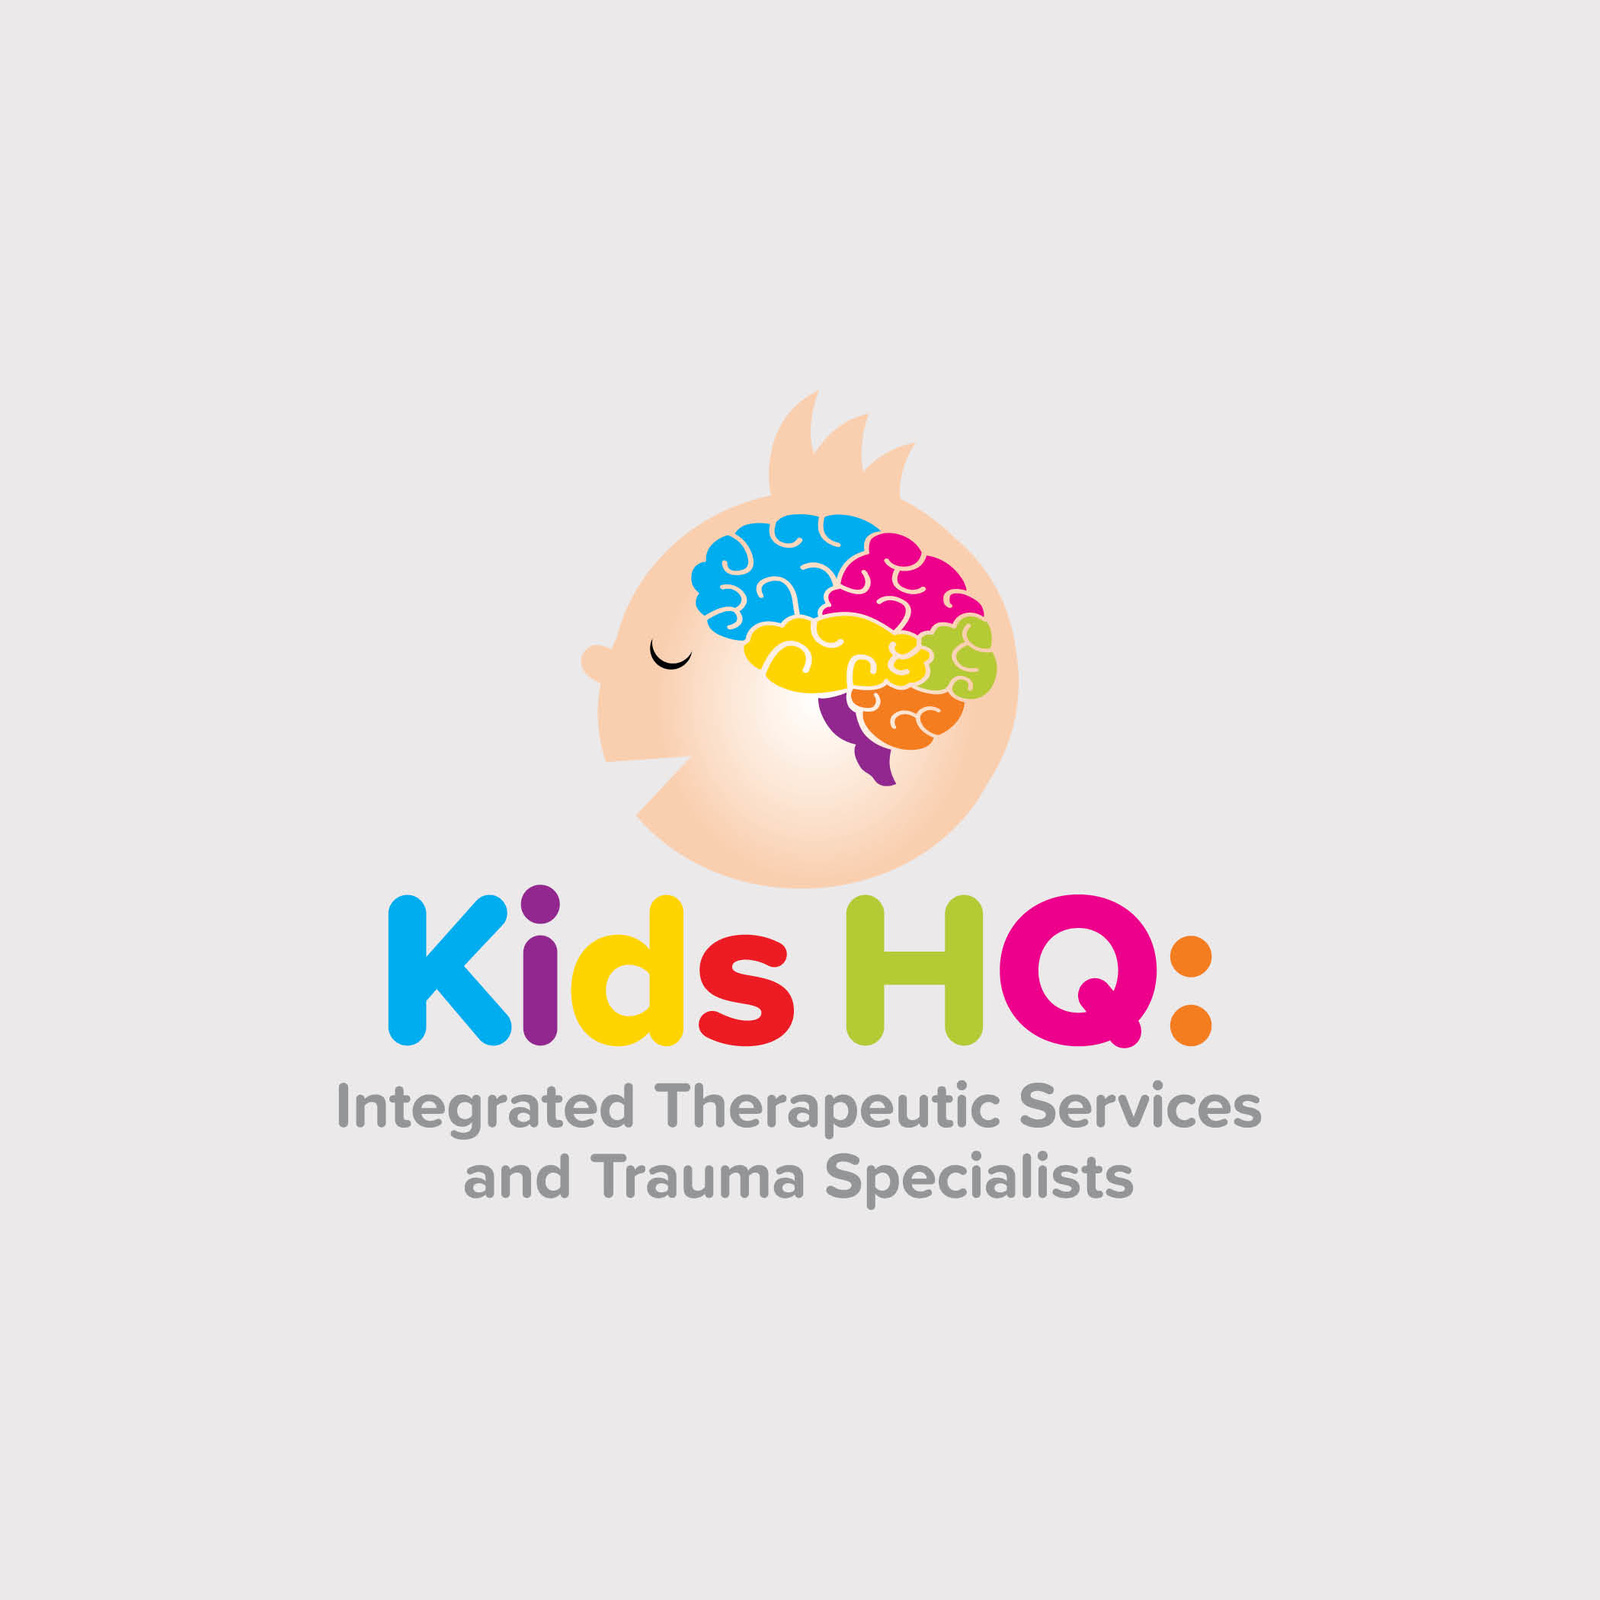 Kids_HQ.jpg